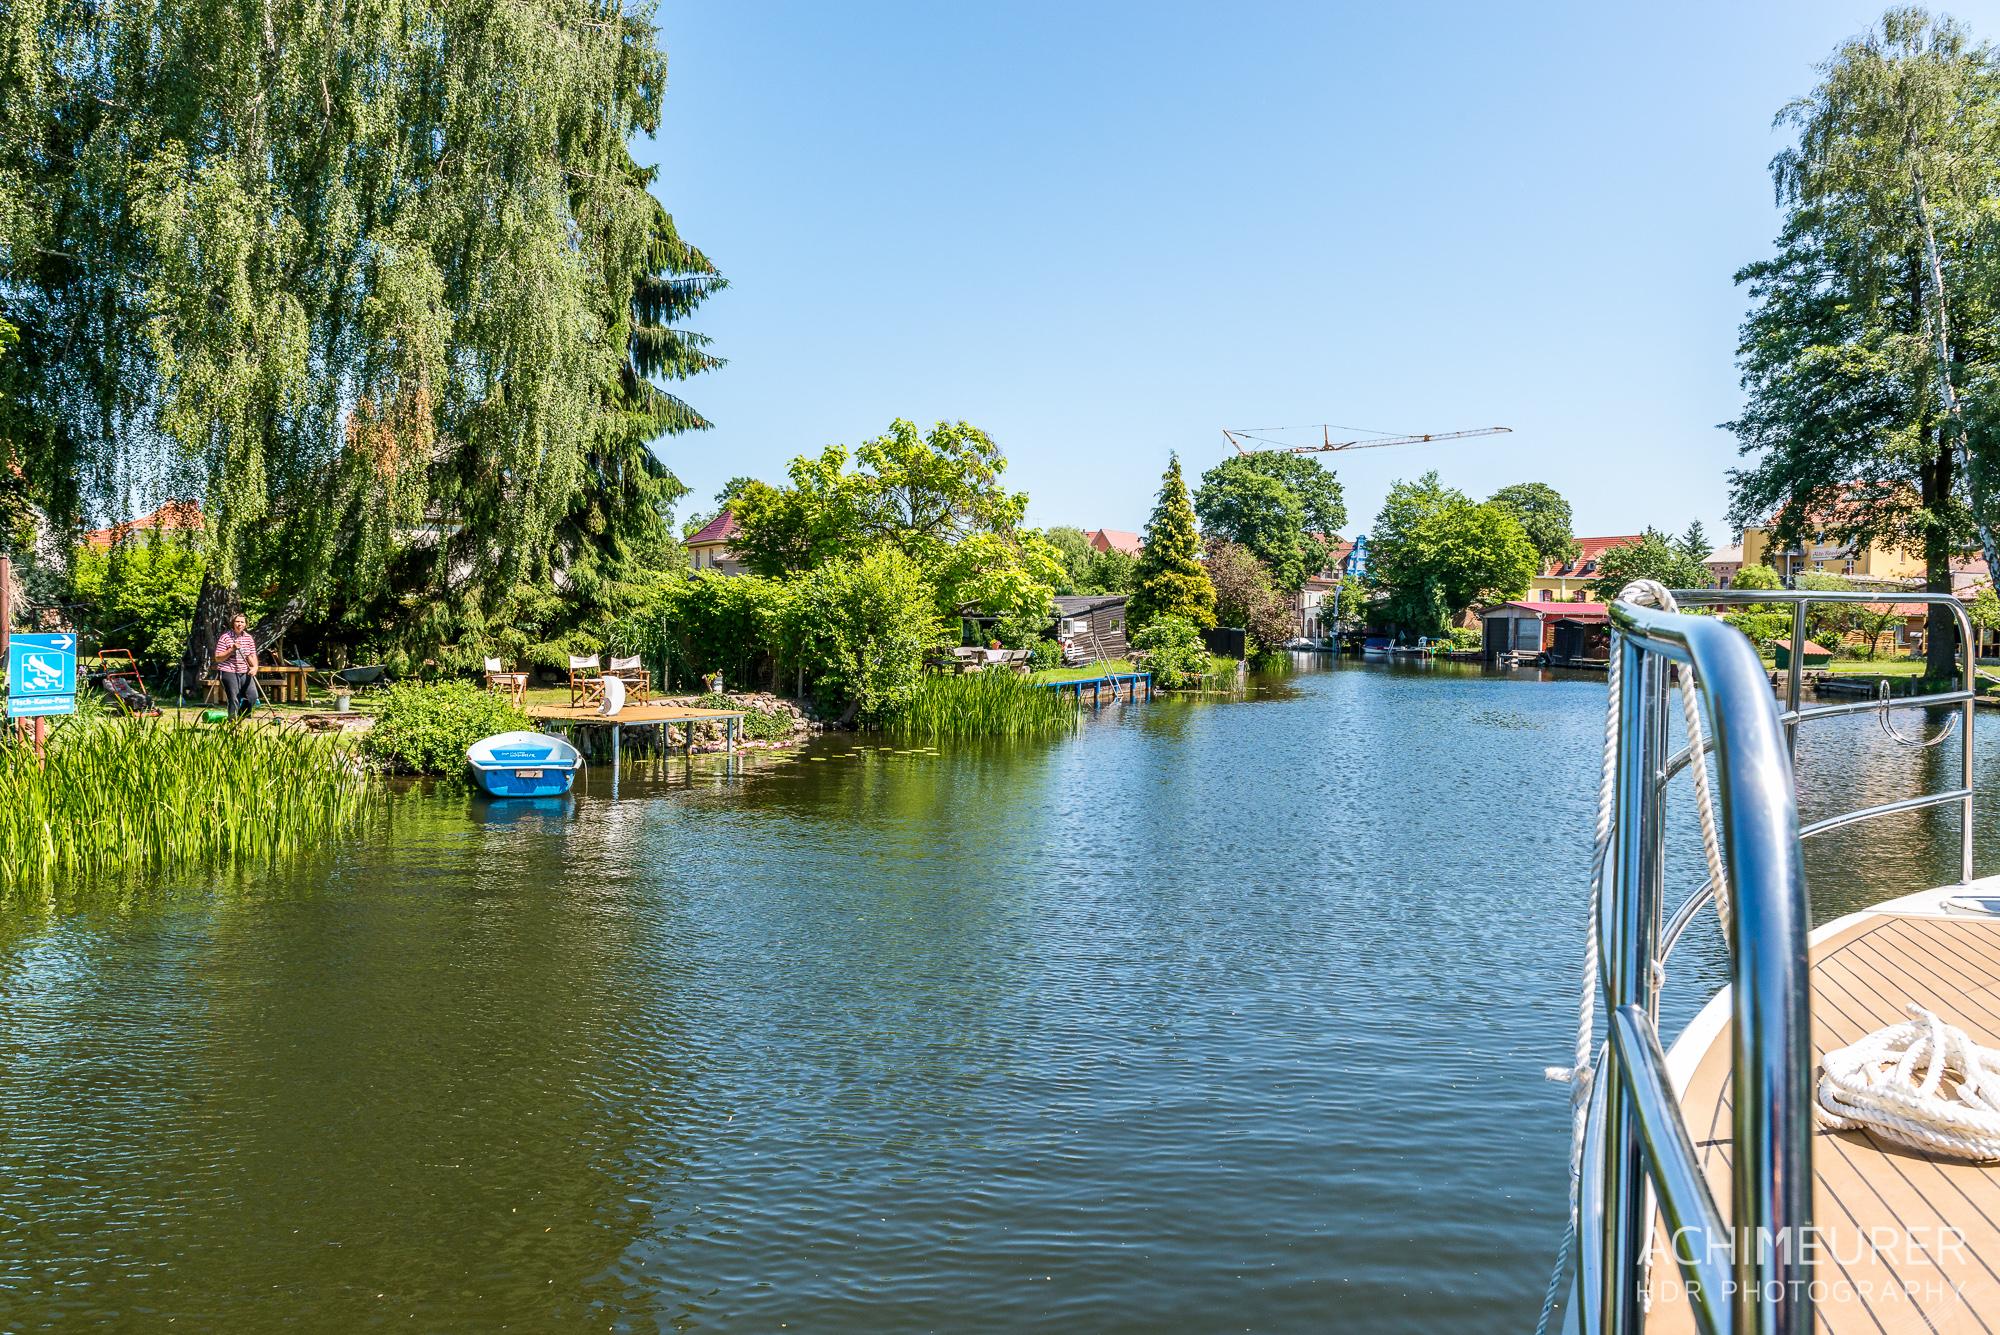 Hausboot-Kuhnle-Mueritz-Mecklenburg-Vorpommern-See_3151